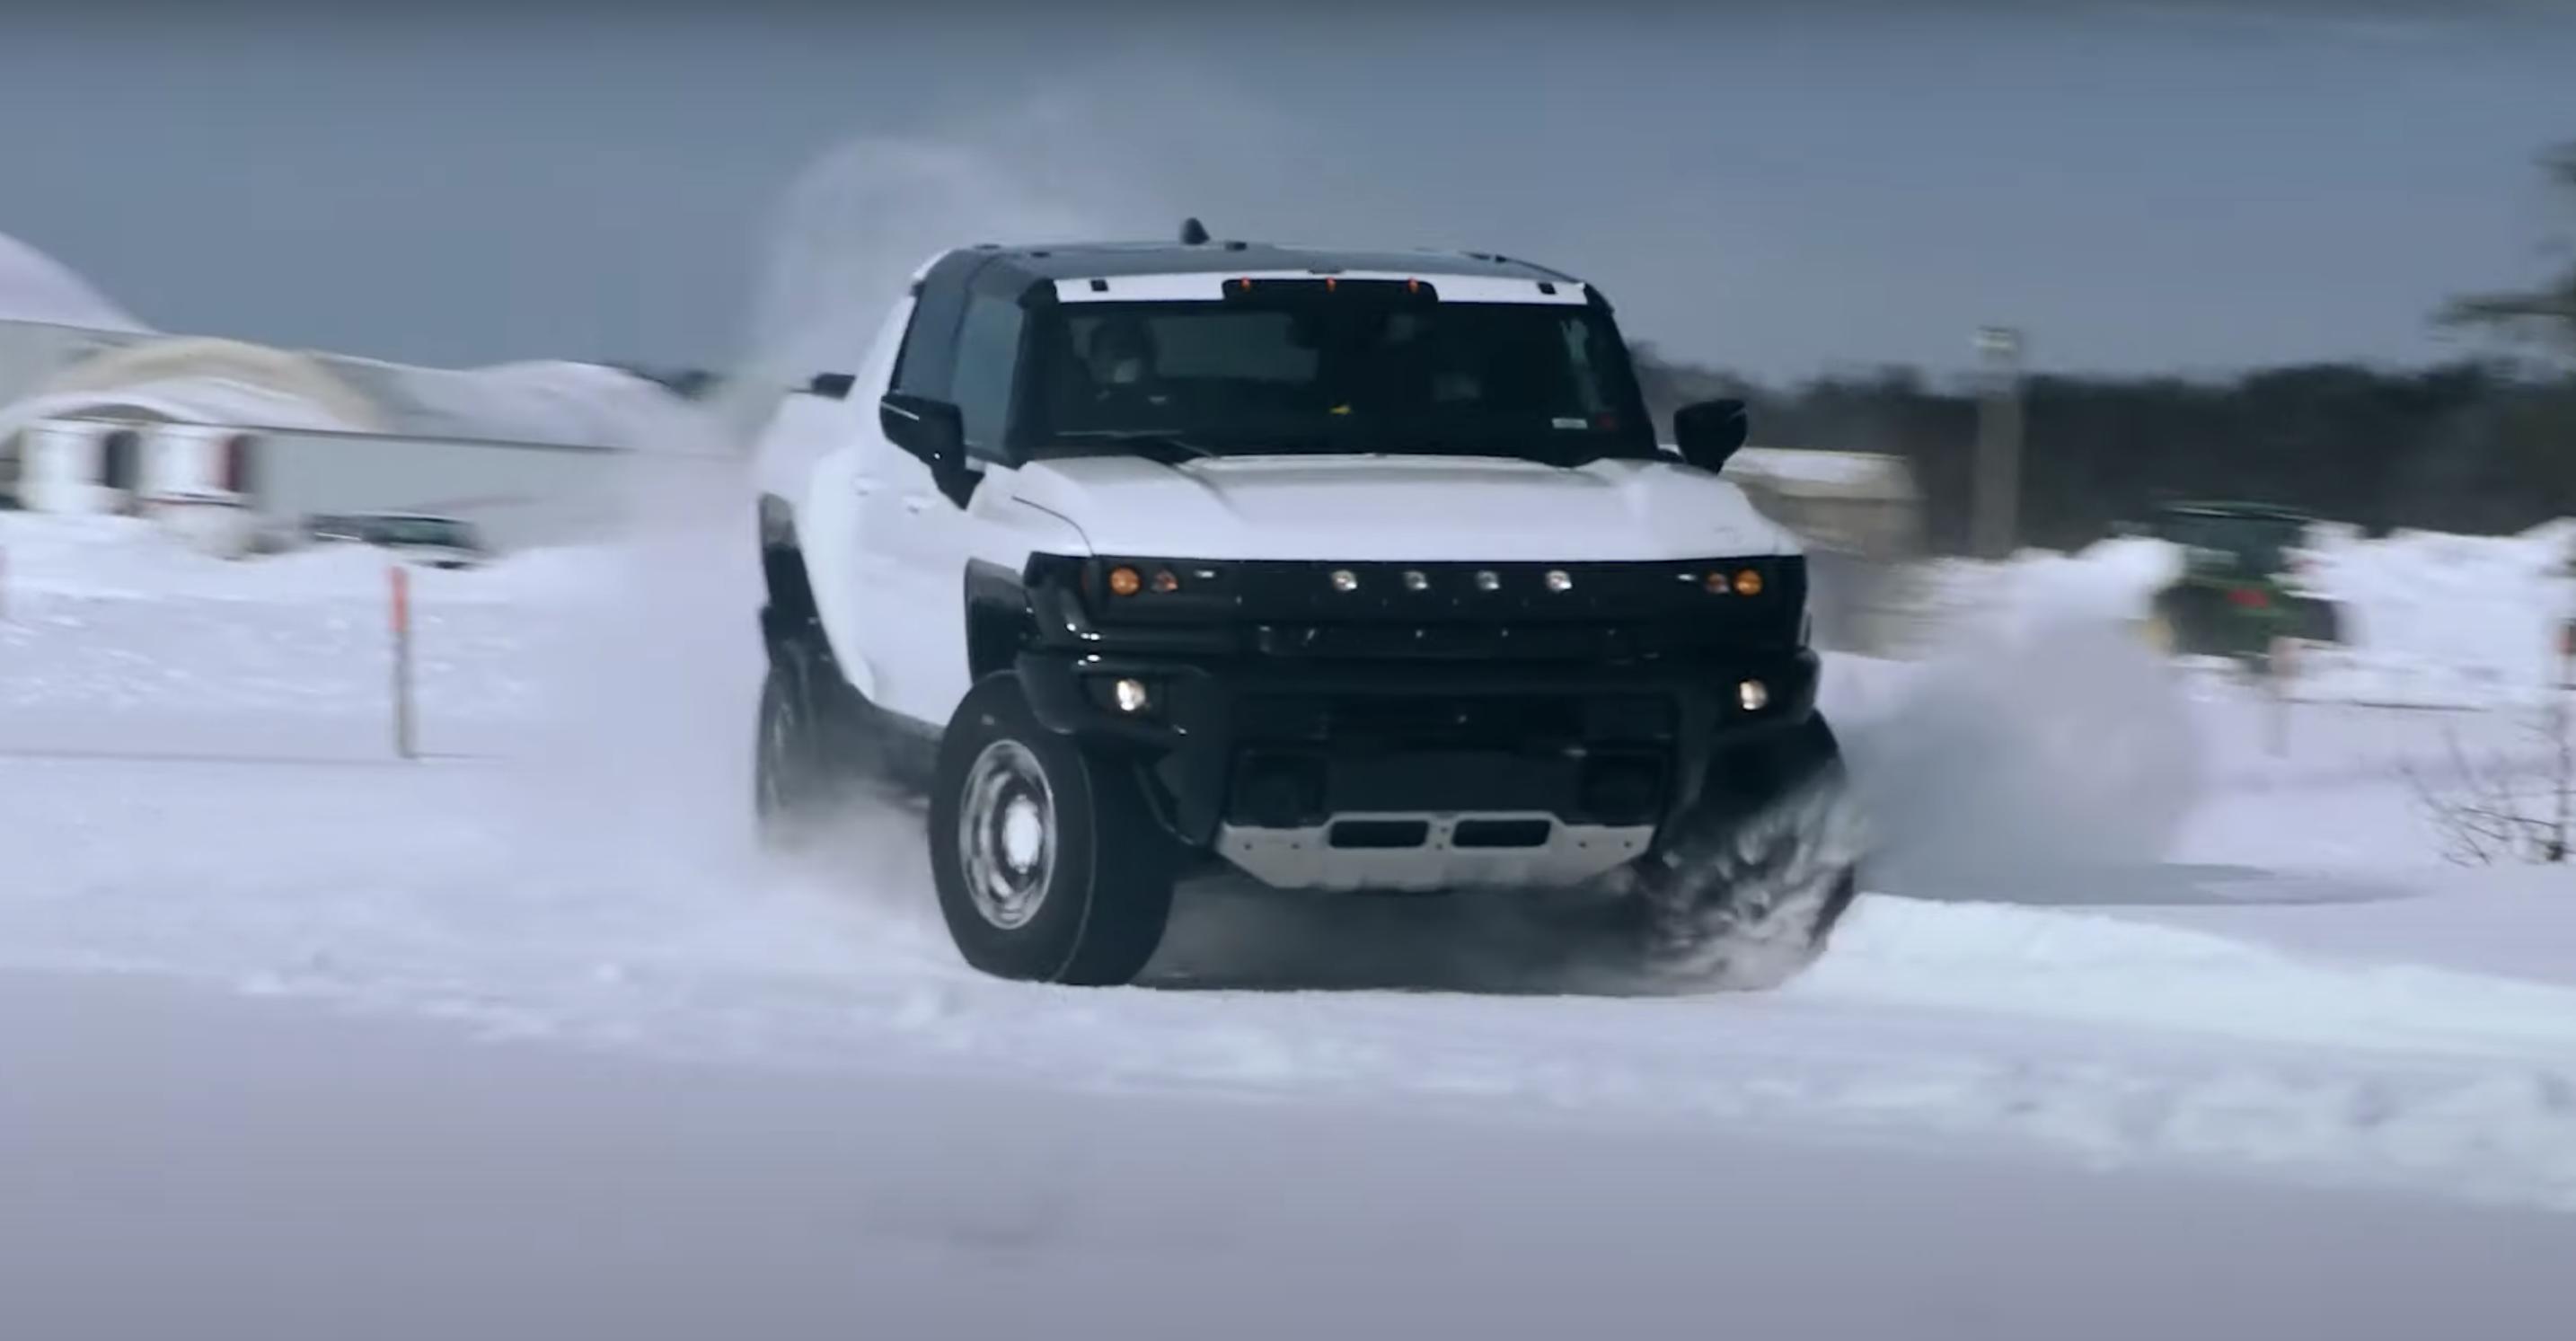 Hummer EV pickup winter testing front camo snow drift